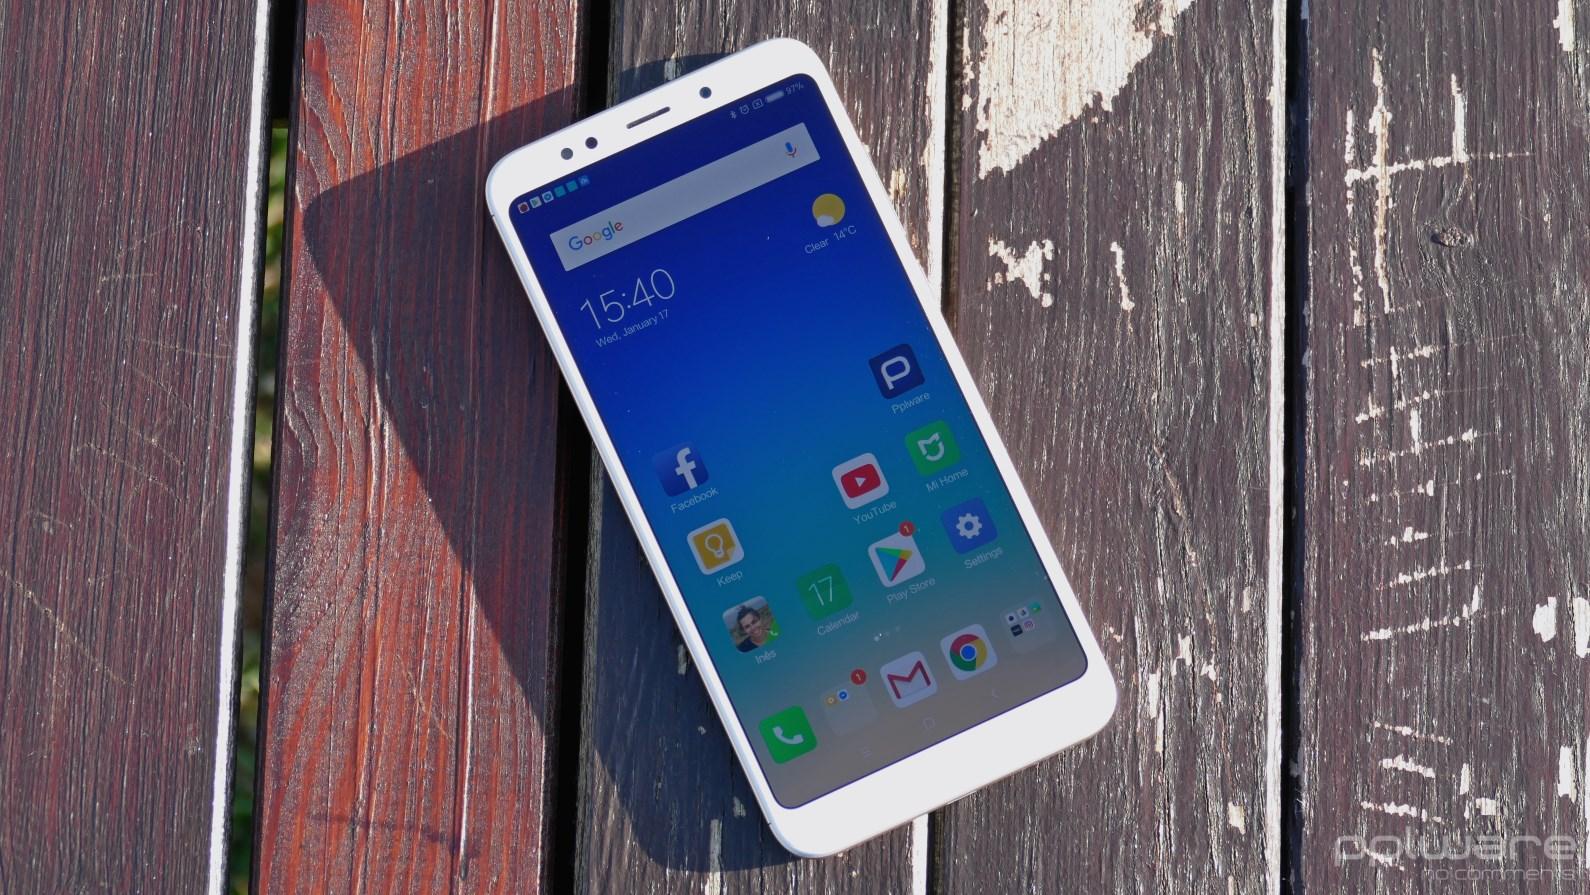 Anlise Xiaomi Redmi 5 Plus Pplware 3gb 32gb Black